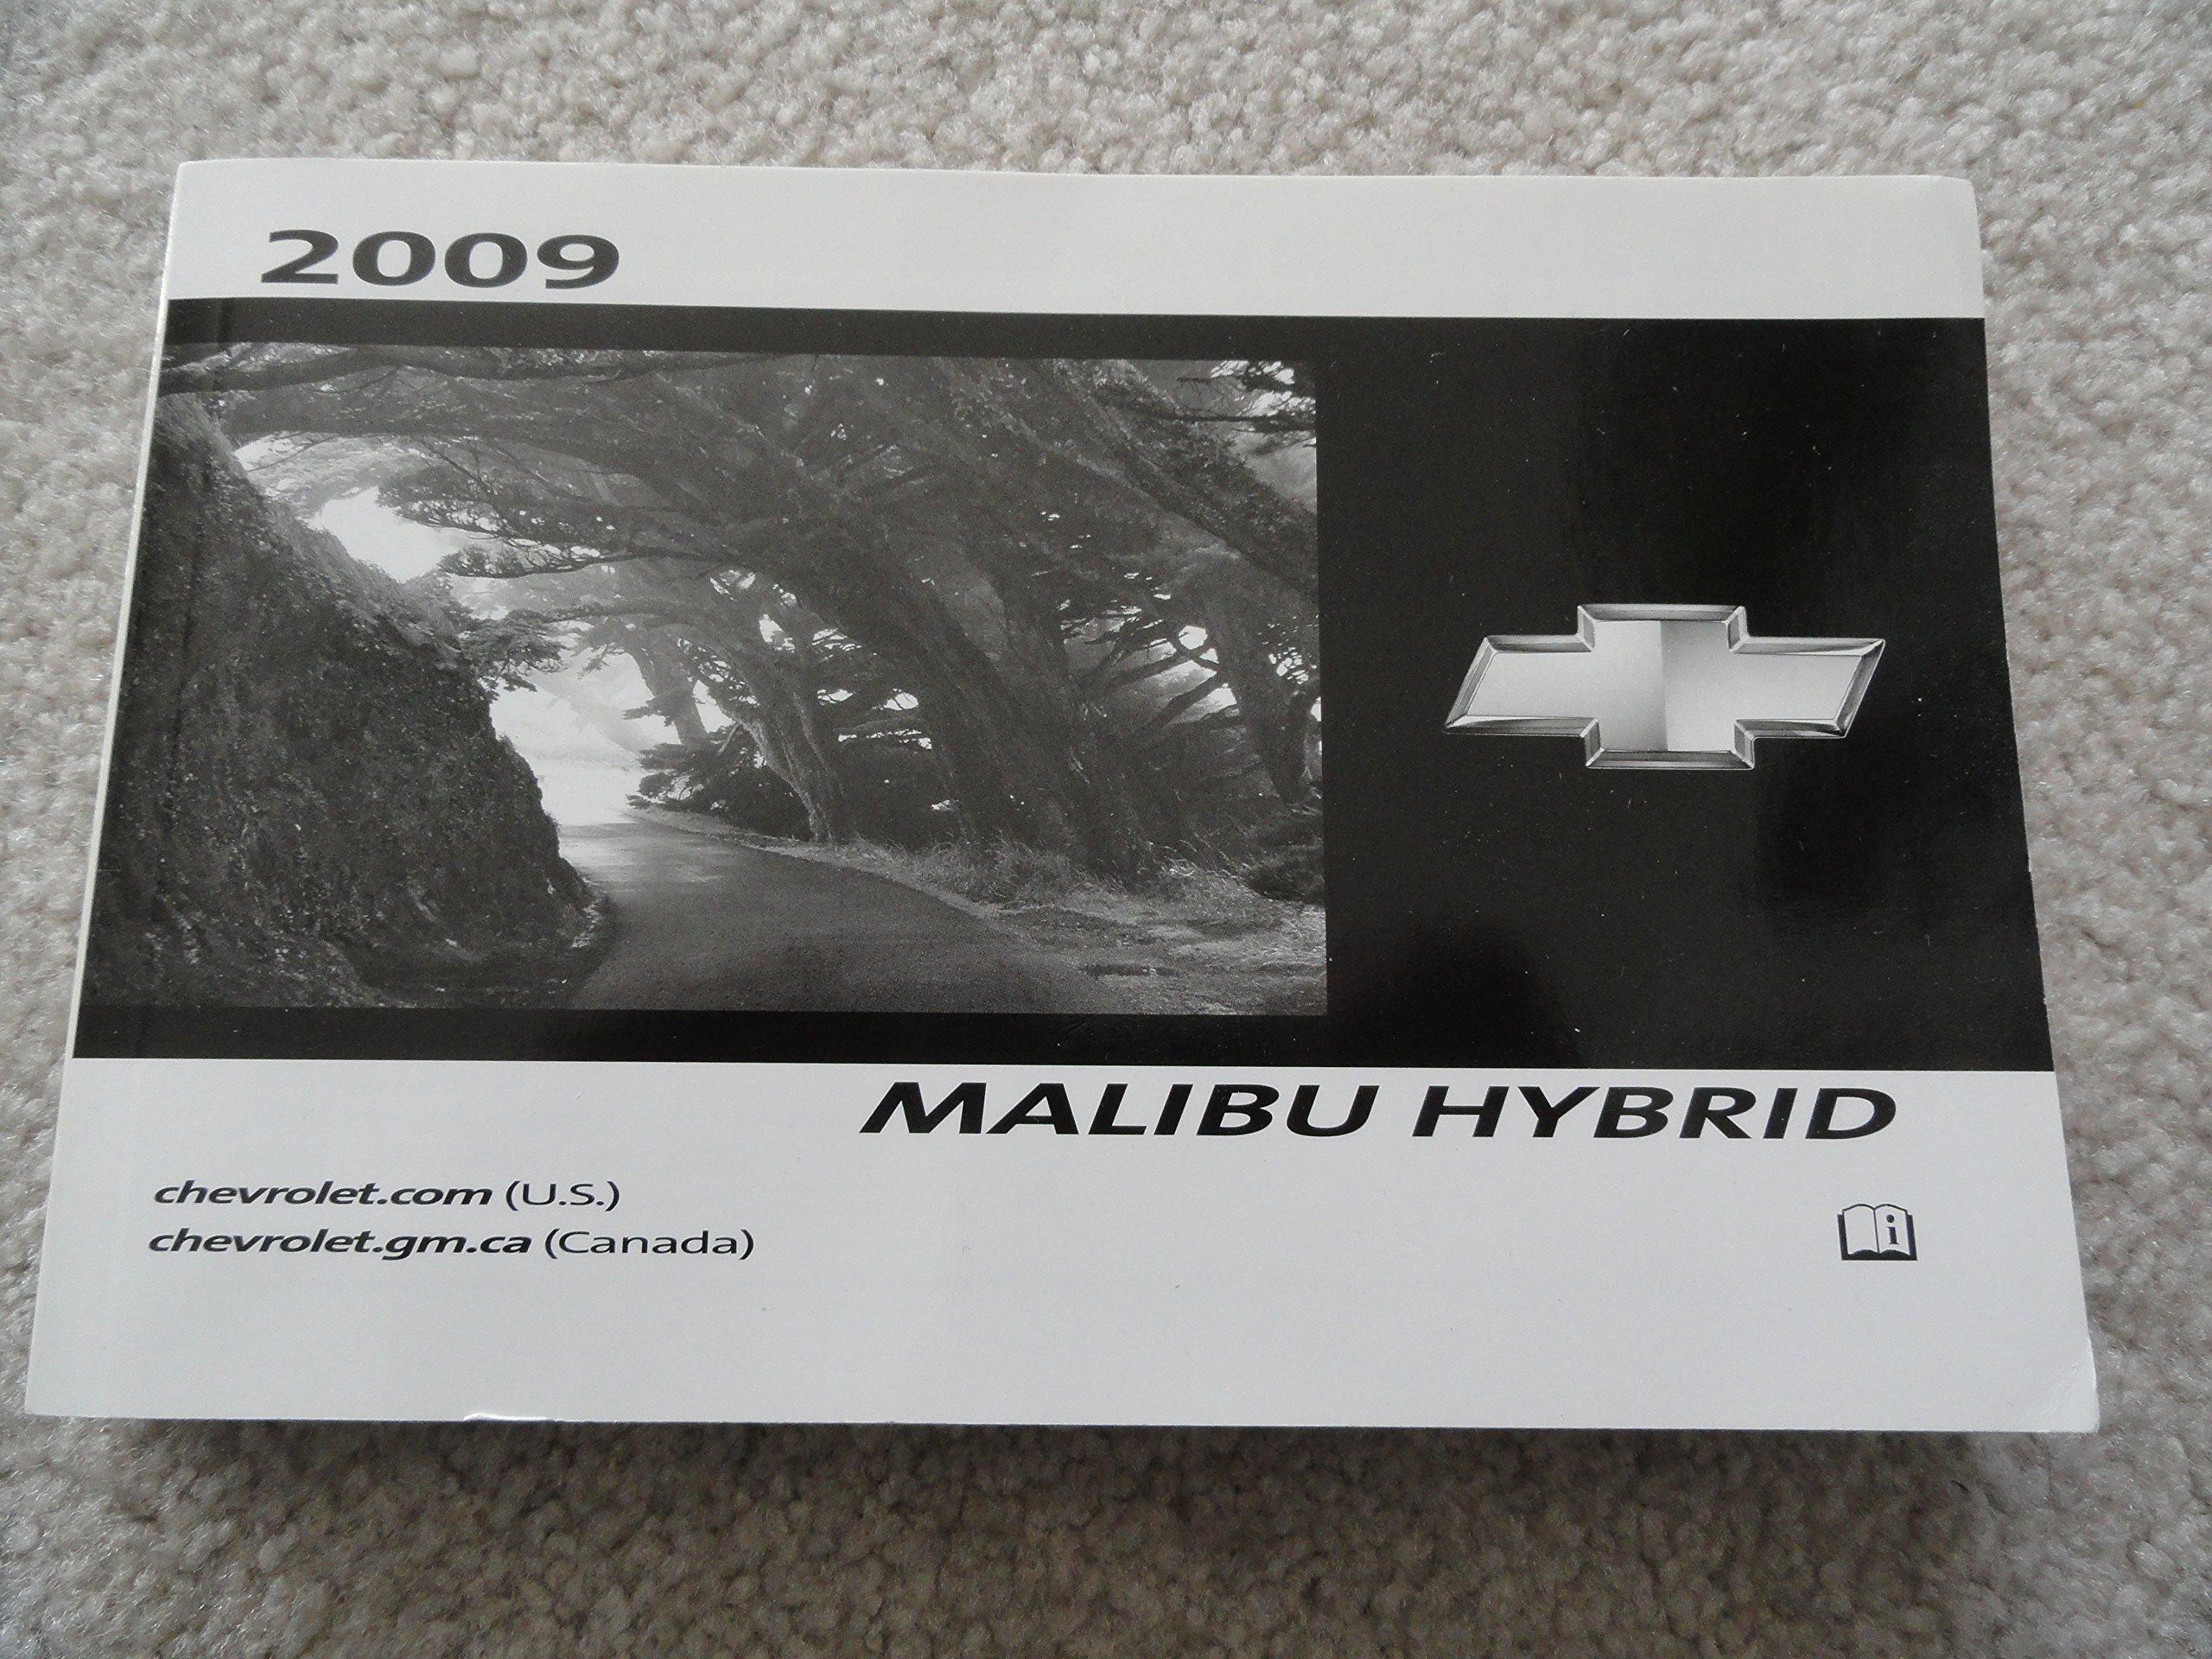 2009 chevrolet chevy malibu owners manual oem 09 | ebay.